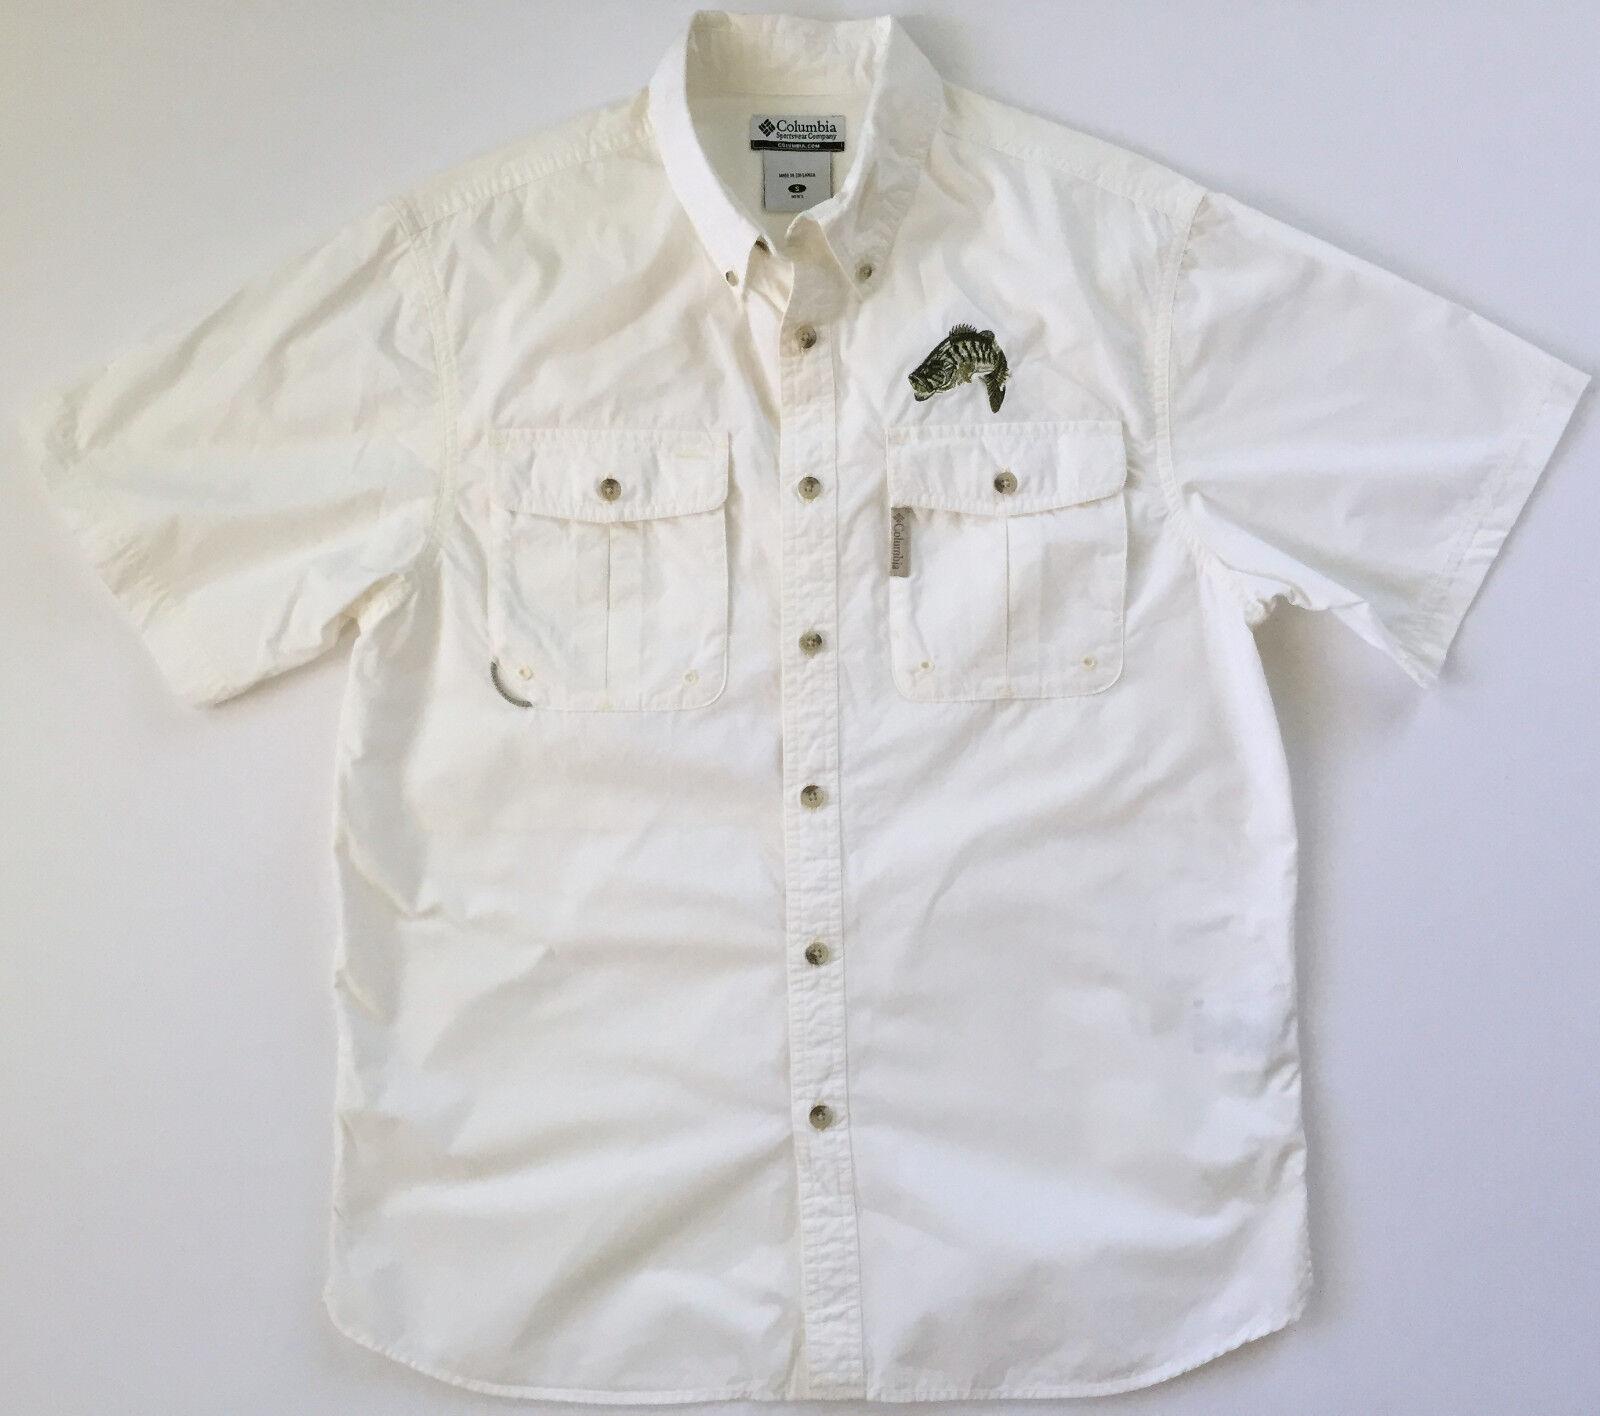 COLUMBIA PFG Performance Mens Short Sleeve White Vented Fishing Shirt Sz S